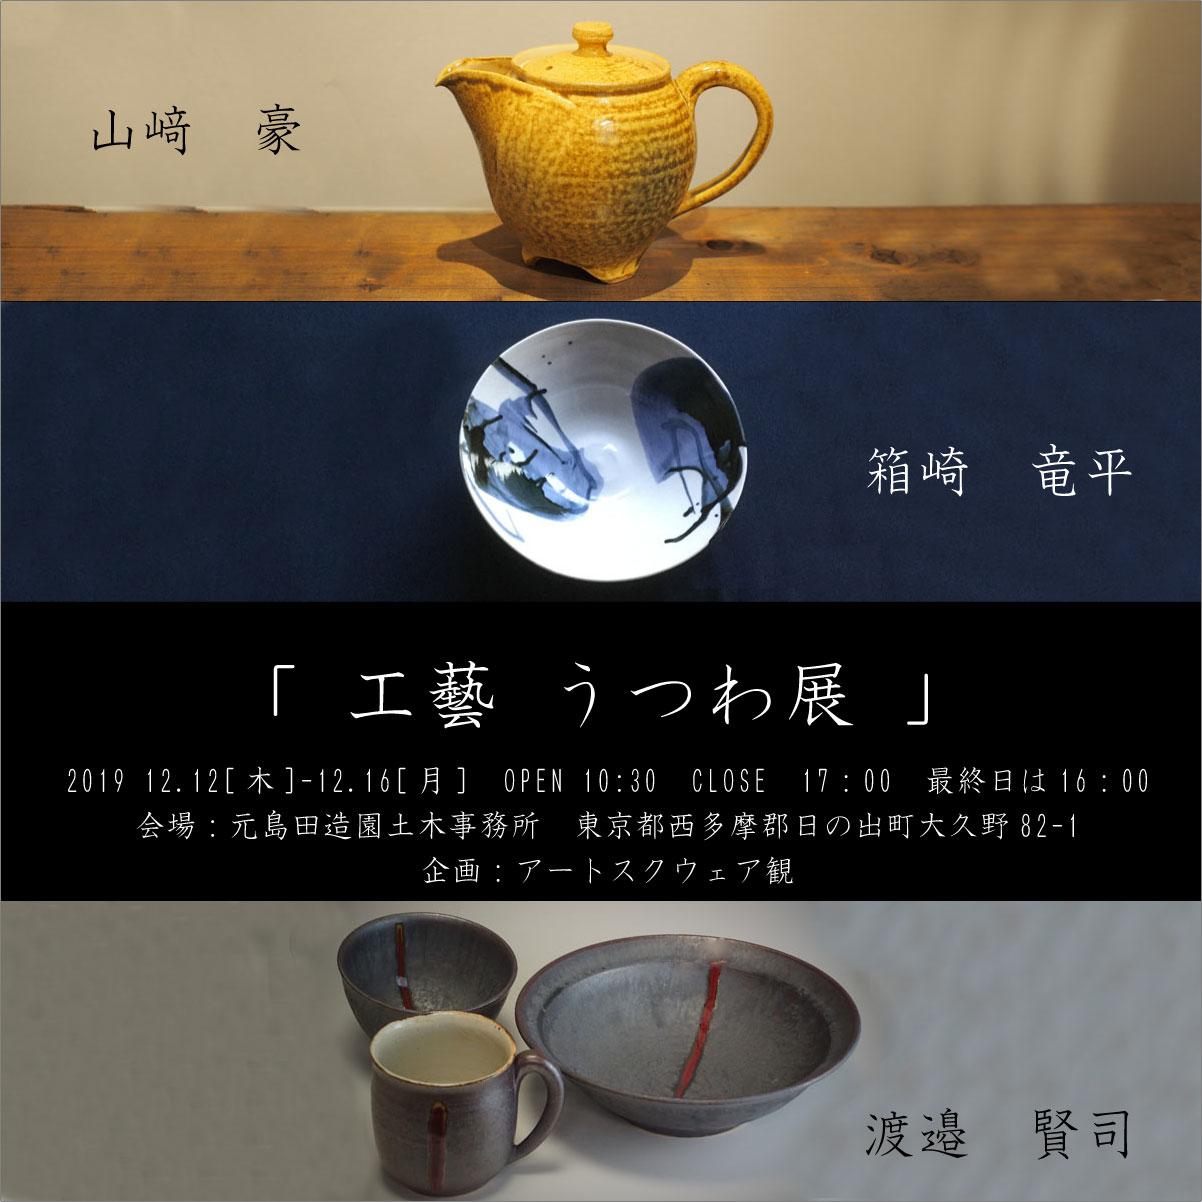 陶芸展示会の案内